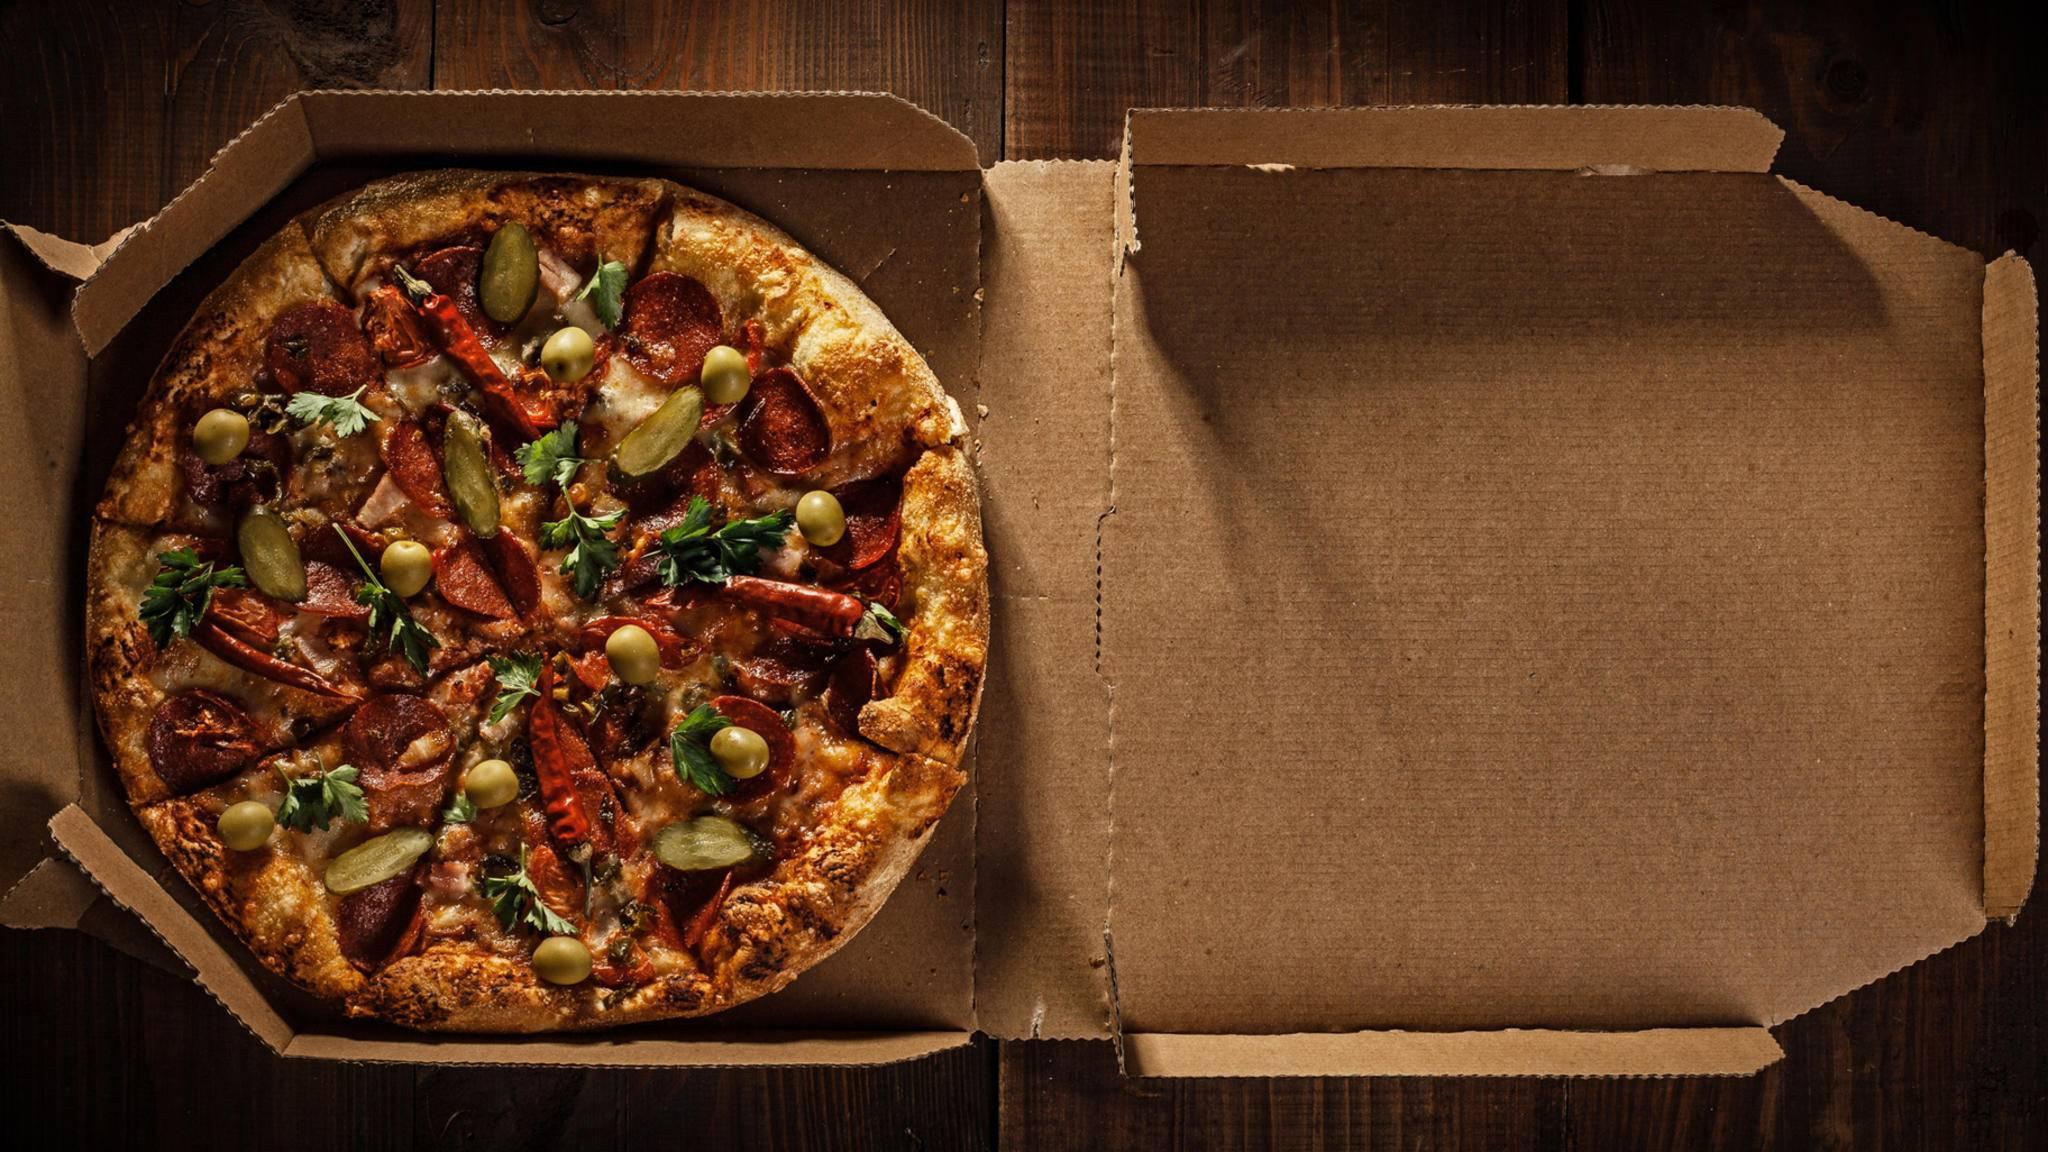 Apples Pizzaverpackung sieht anders aus als übliche Pizzakartons.